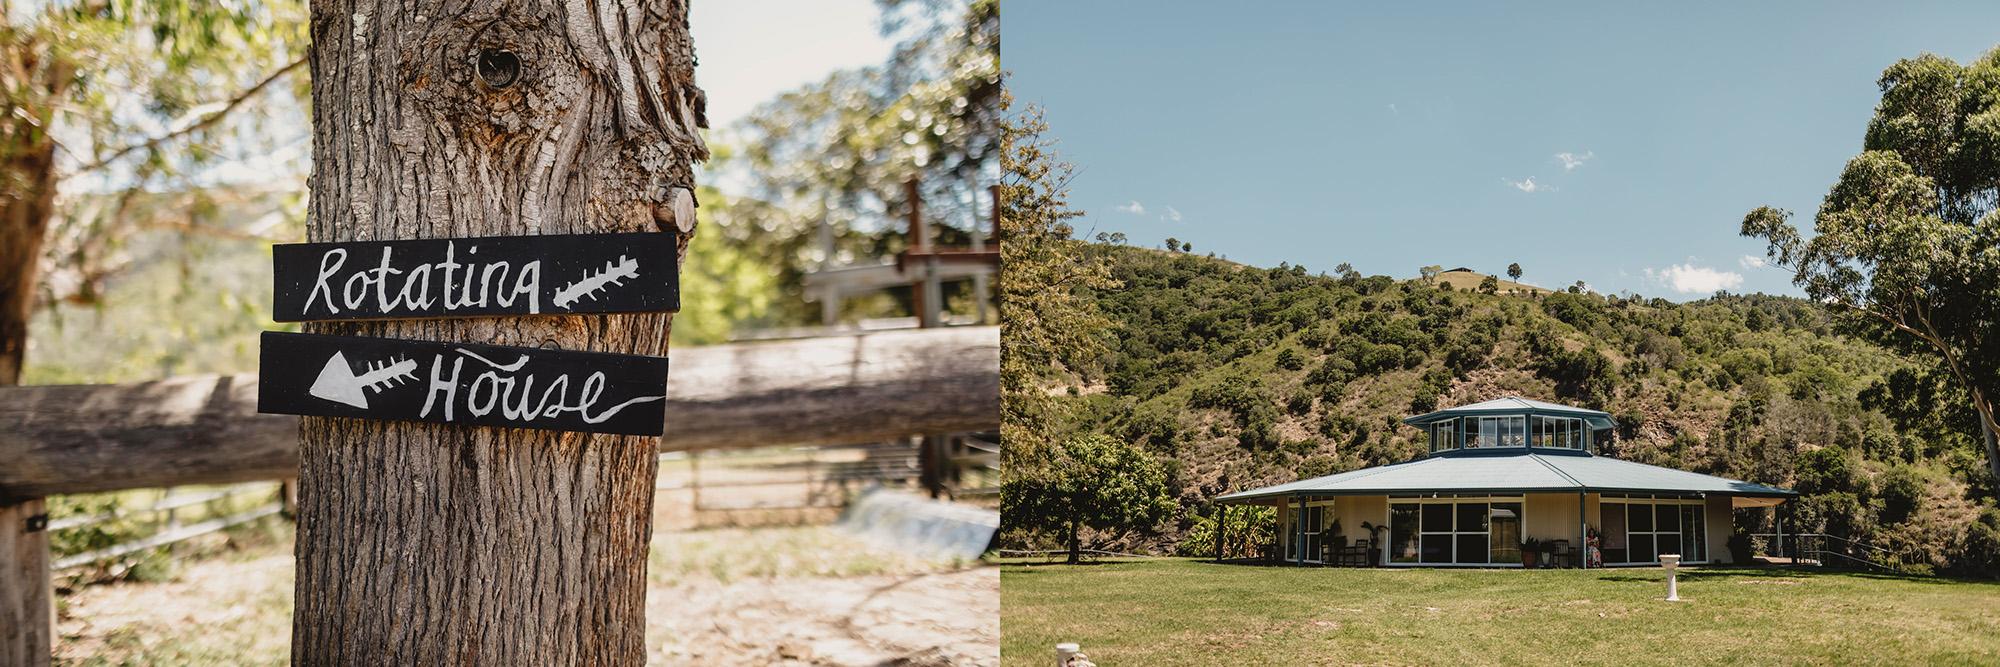 Longview farm wedding caffreys flat with rotating house